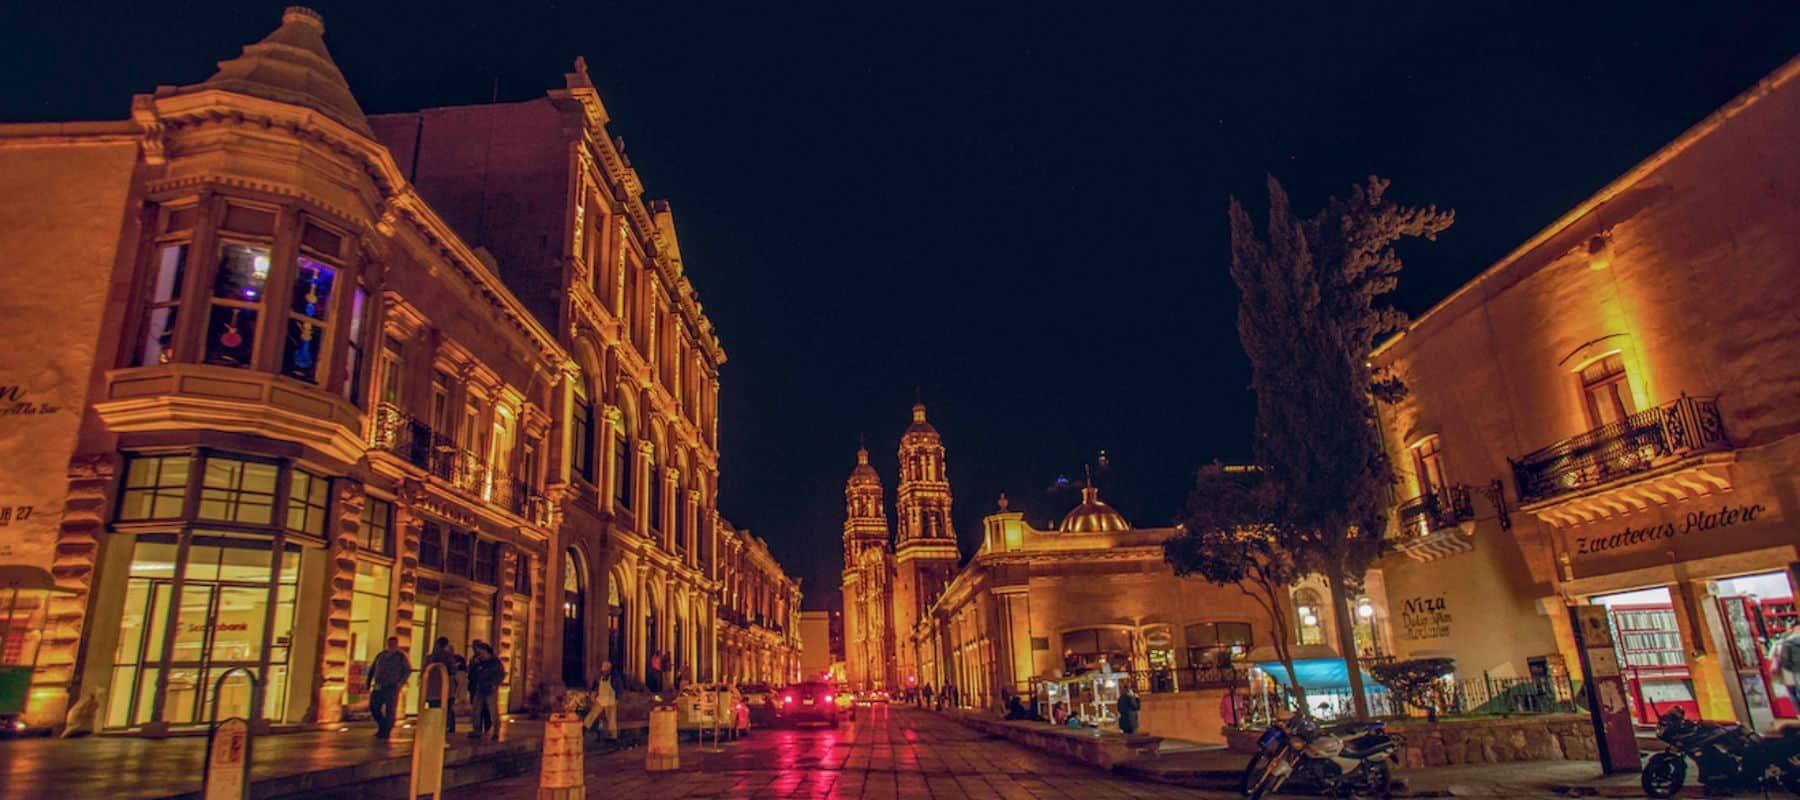 Turismo En Zacatecas Travel Guide